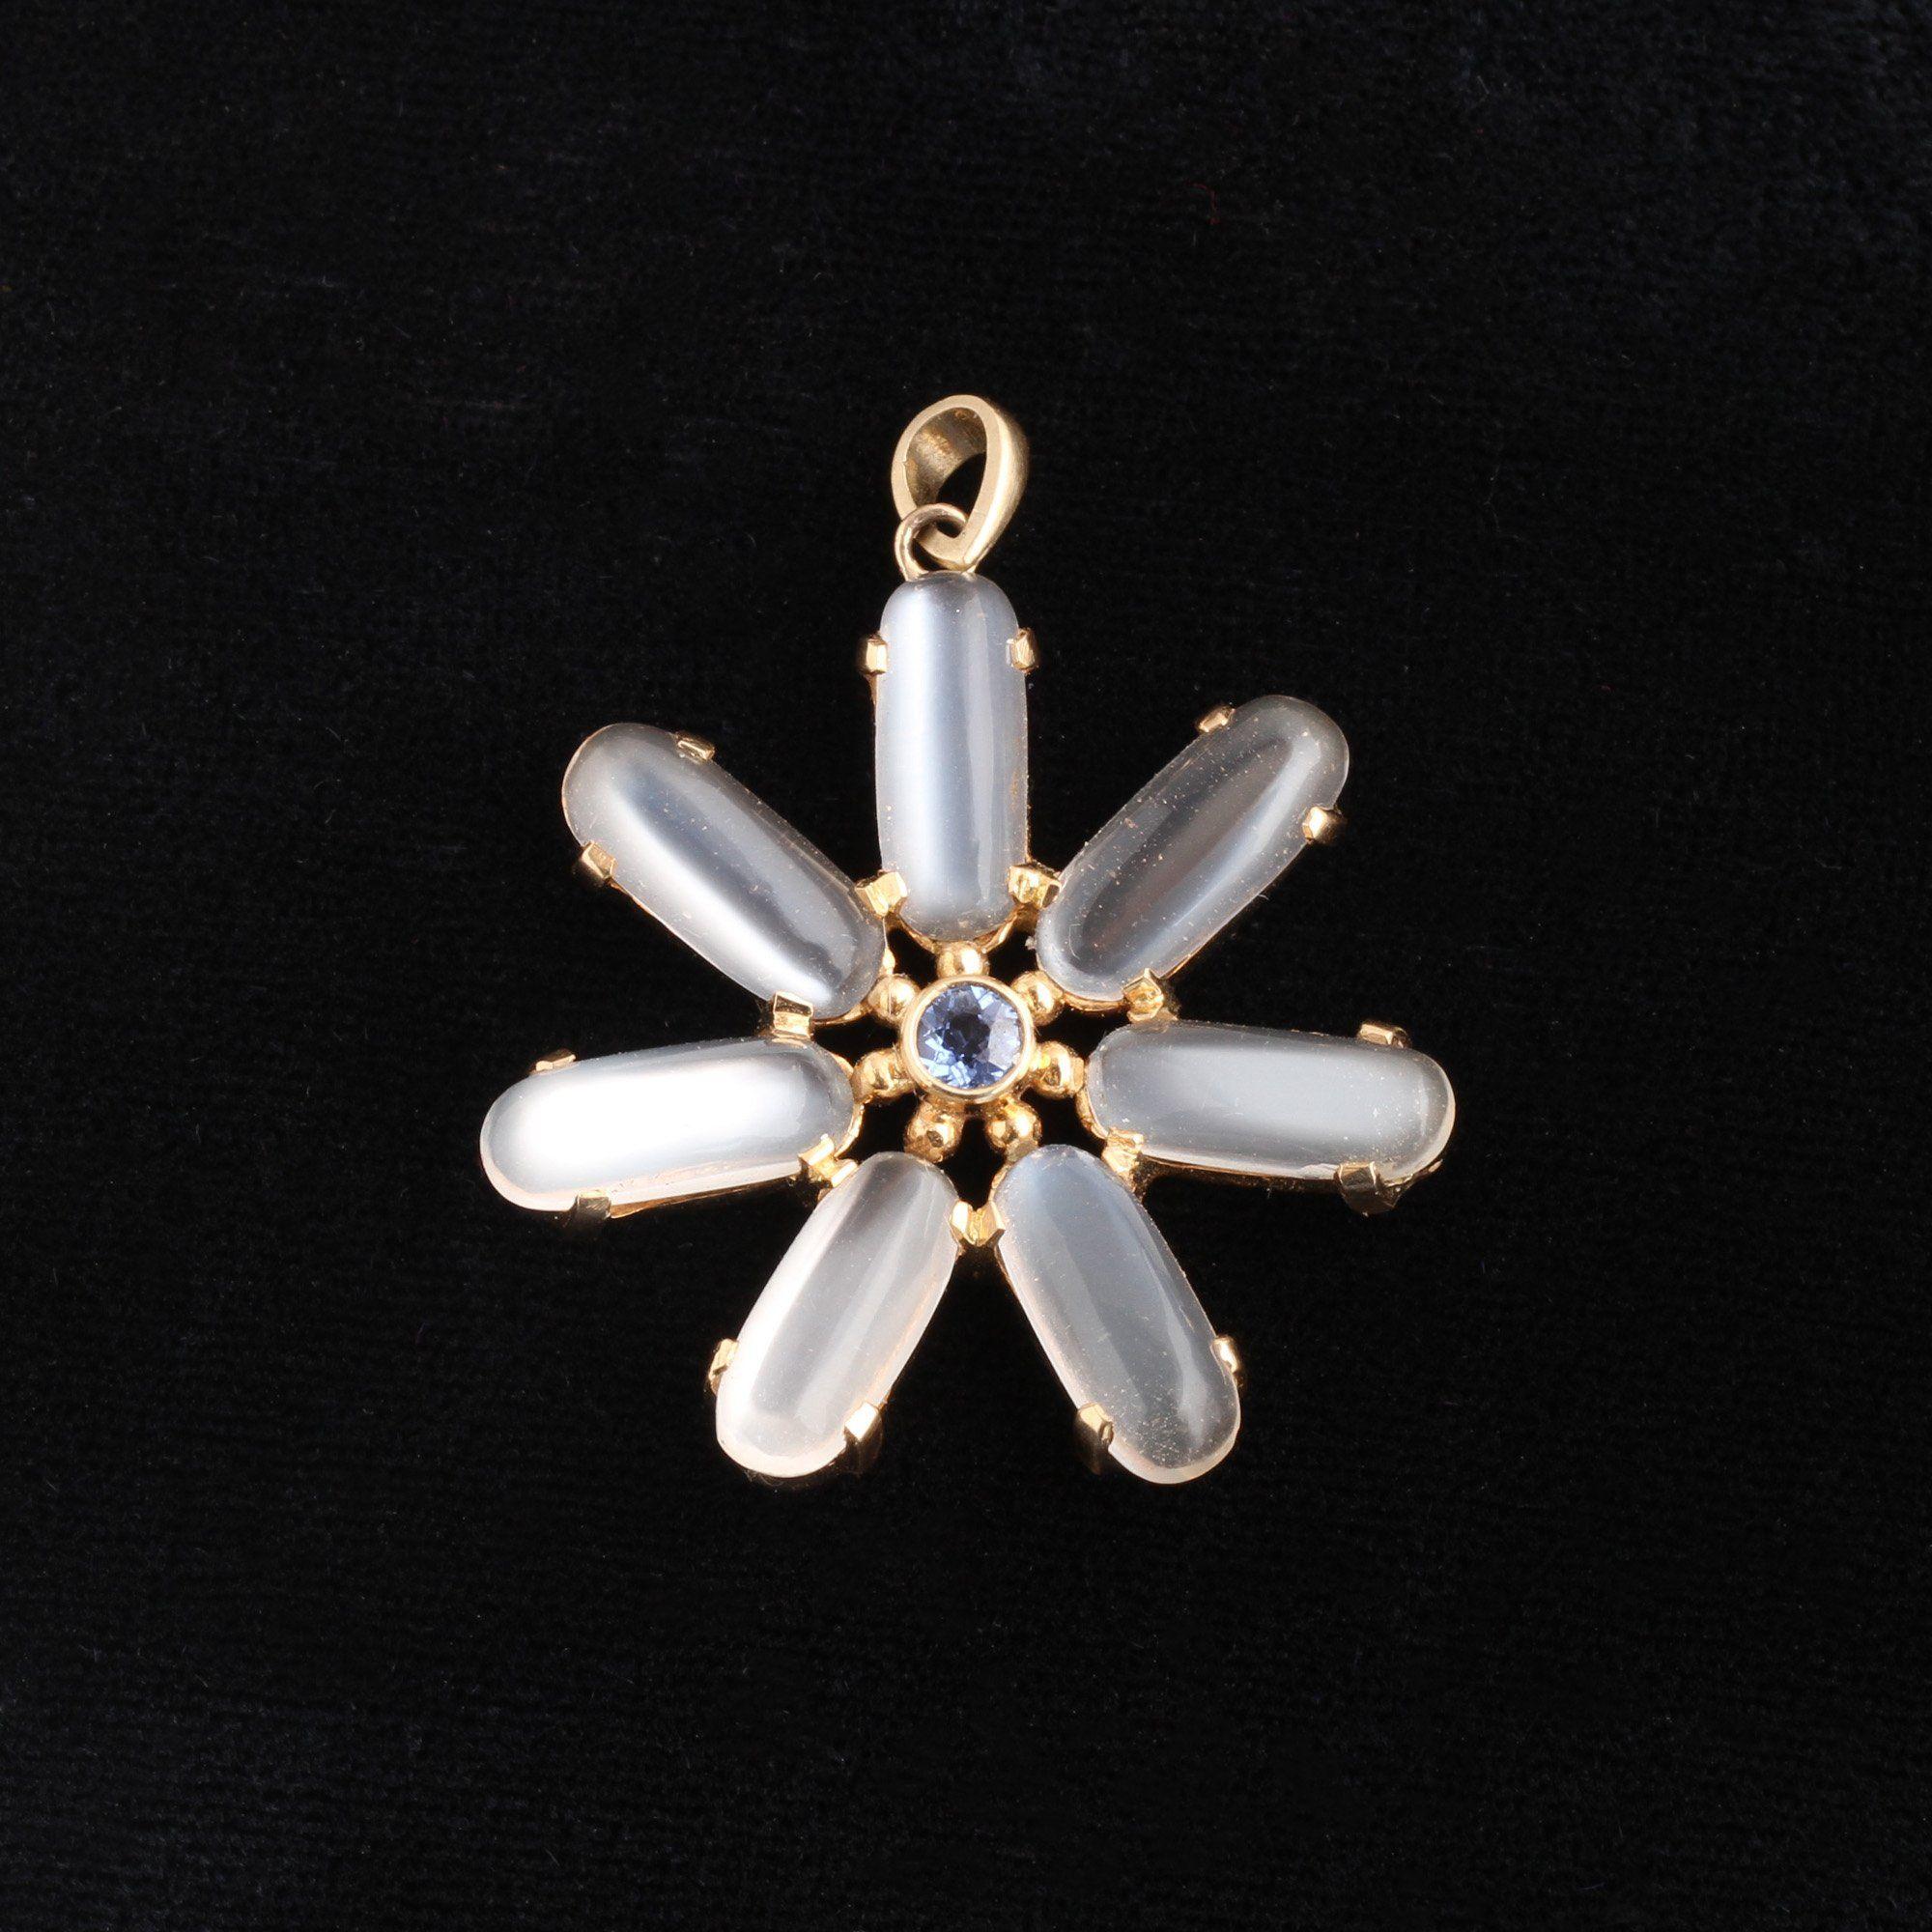 Vintage Moonstone and Sapphire Flower Pendant